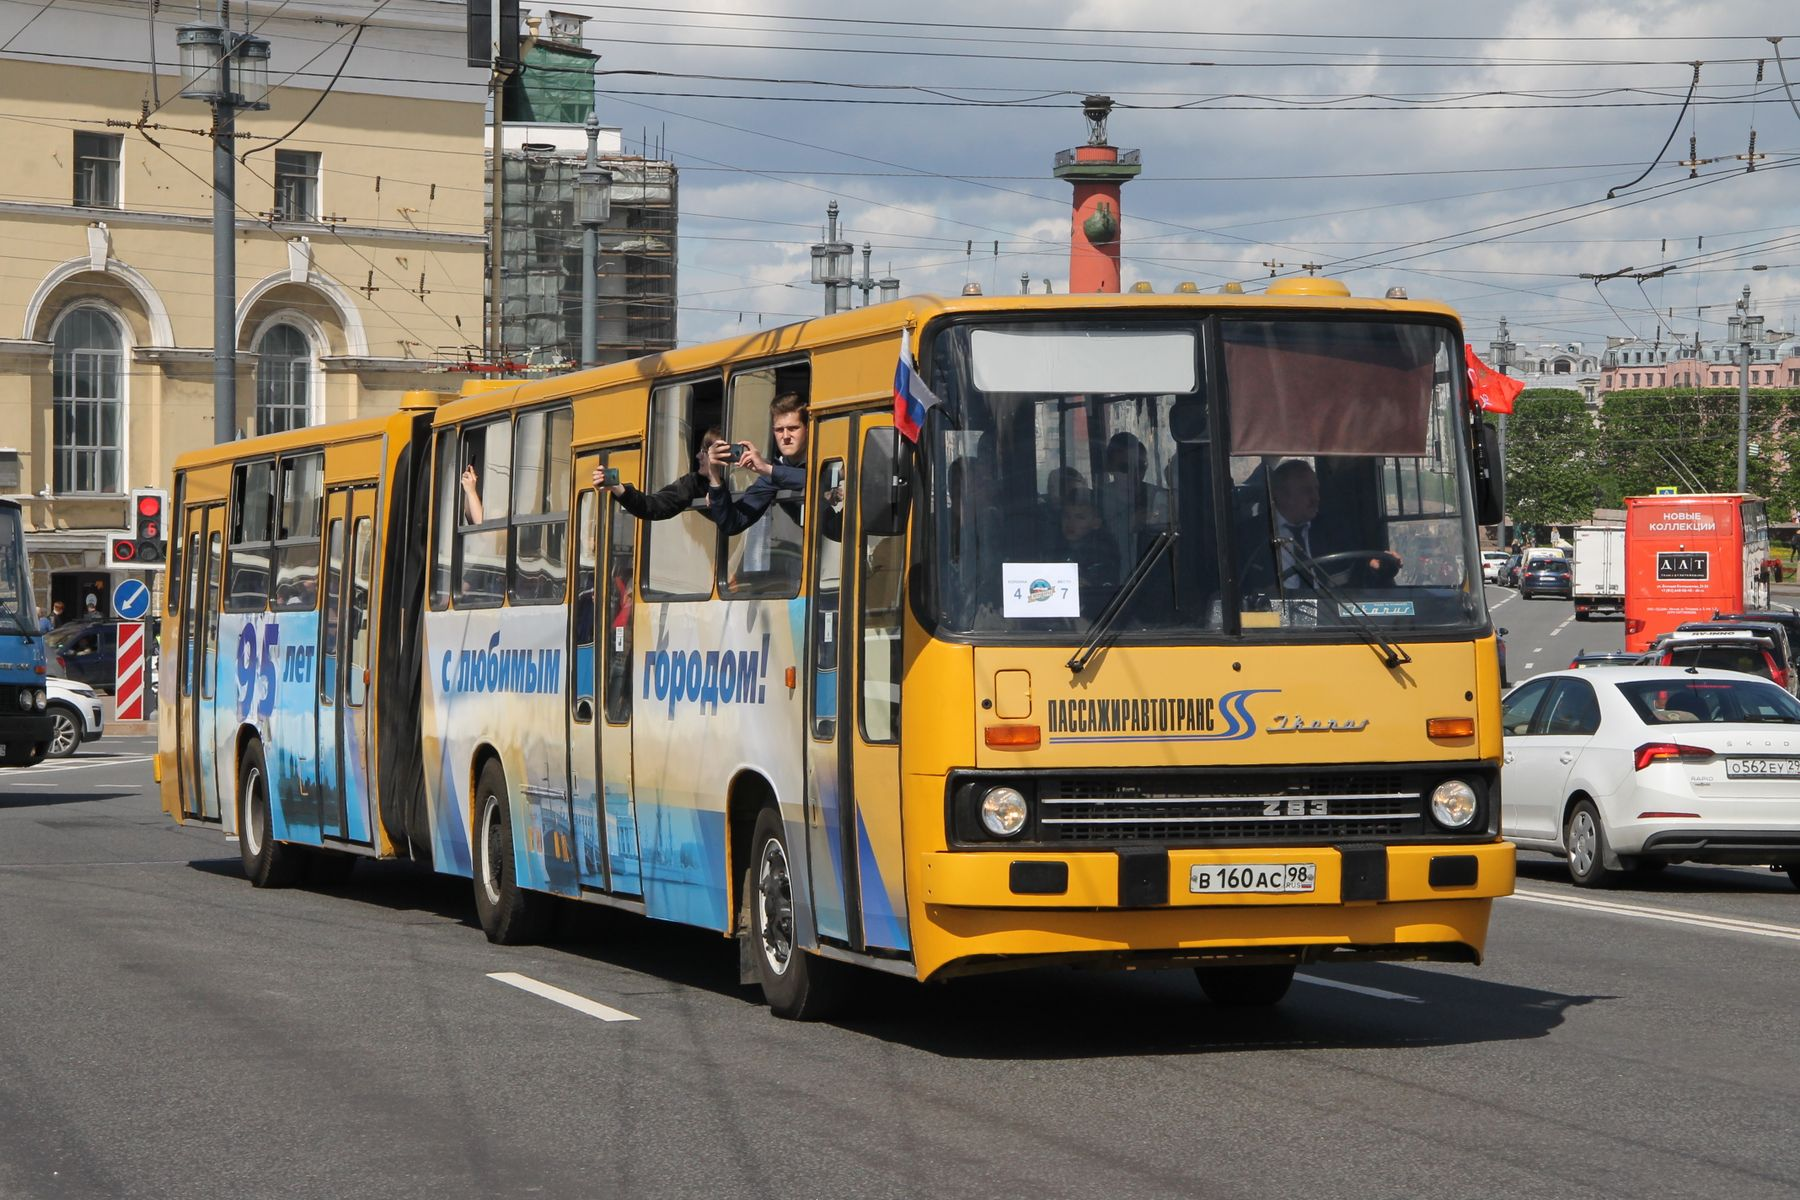 Икарус-283 Санкт-Петербург Петербкрг автобус Икарус Икарус-283